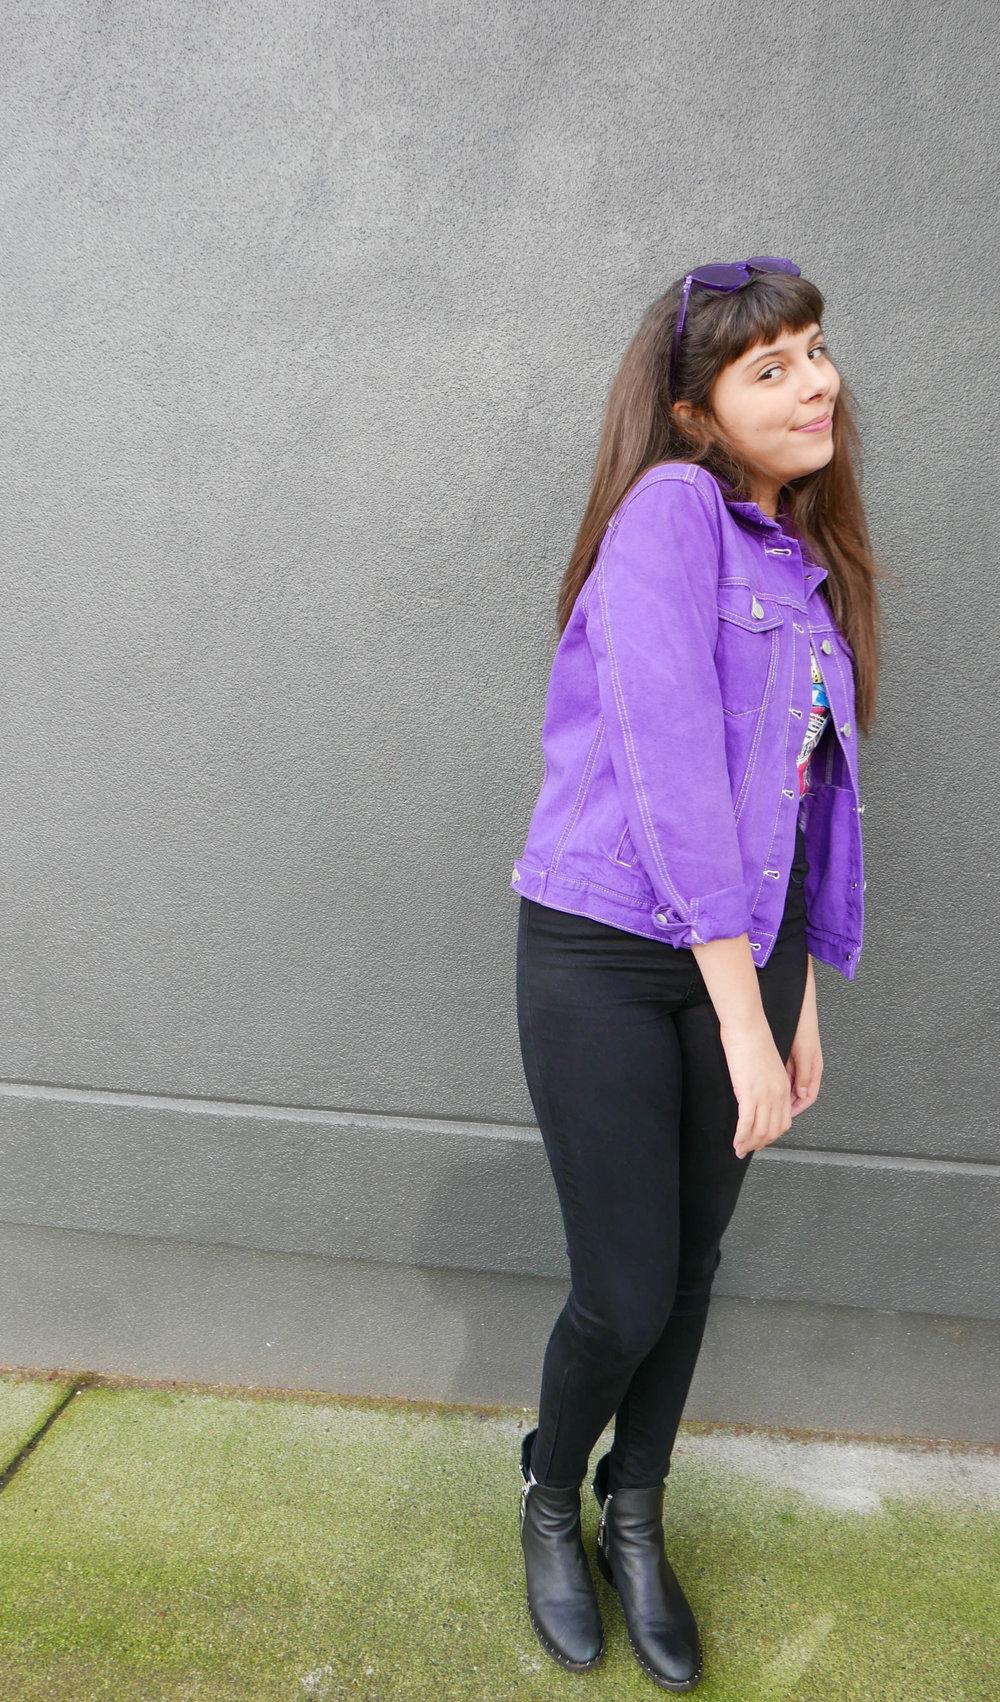 stylingbrooklynteenfashionblogger_3042018brooklynteenageblogger7.jpg